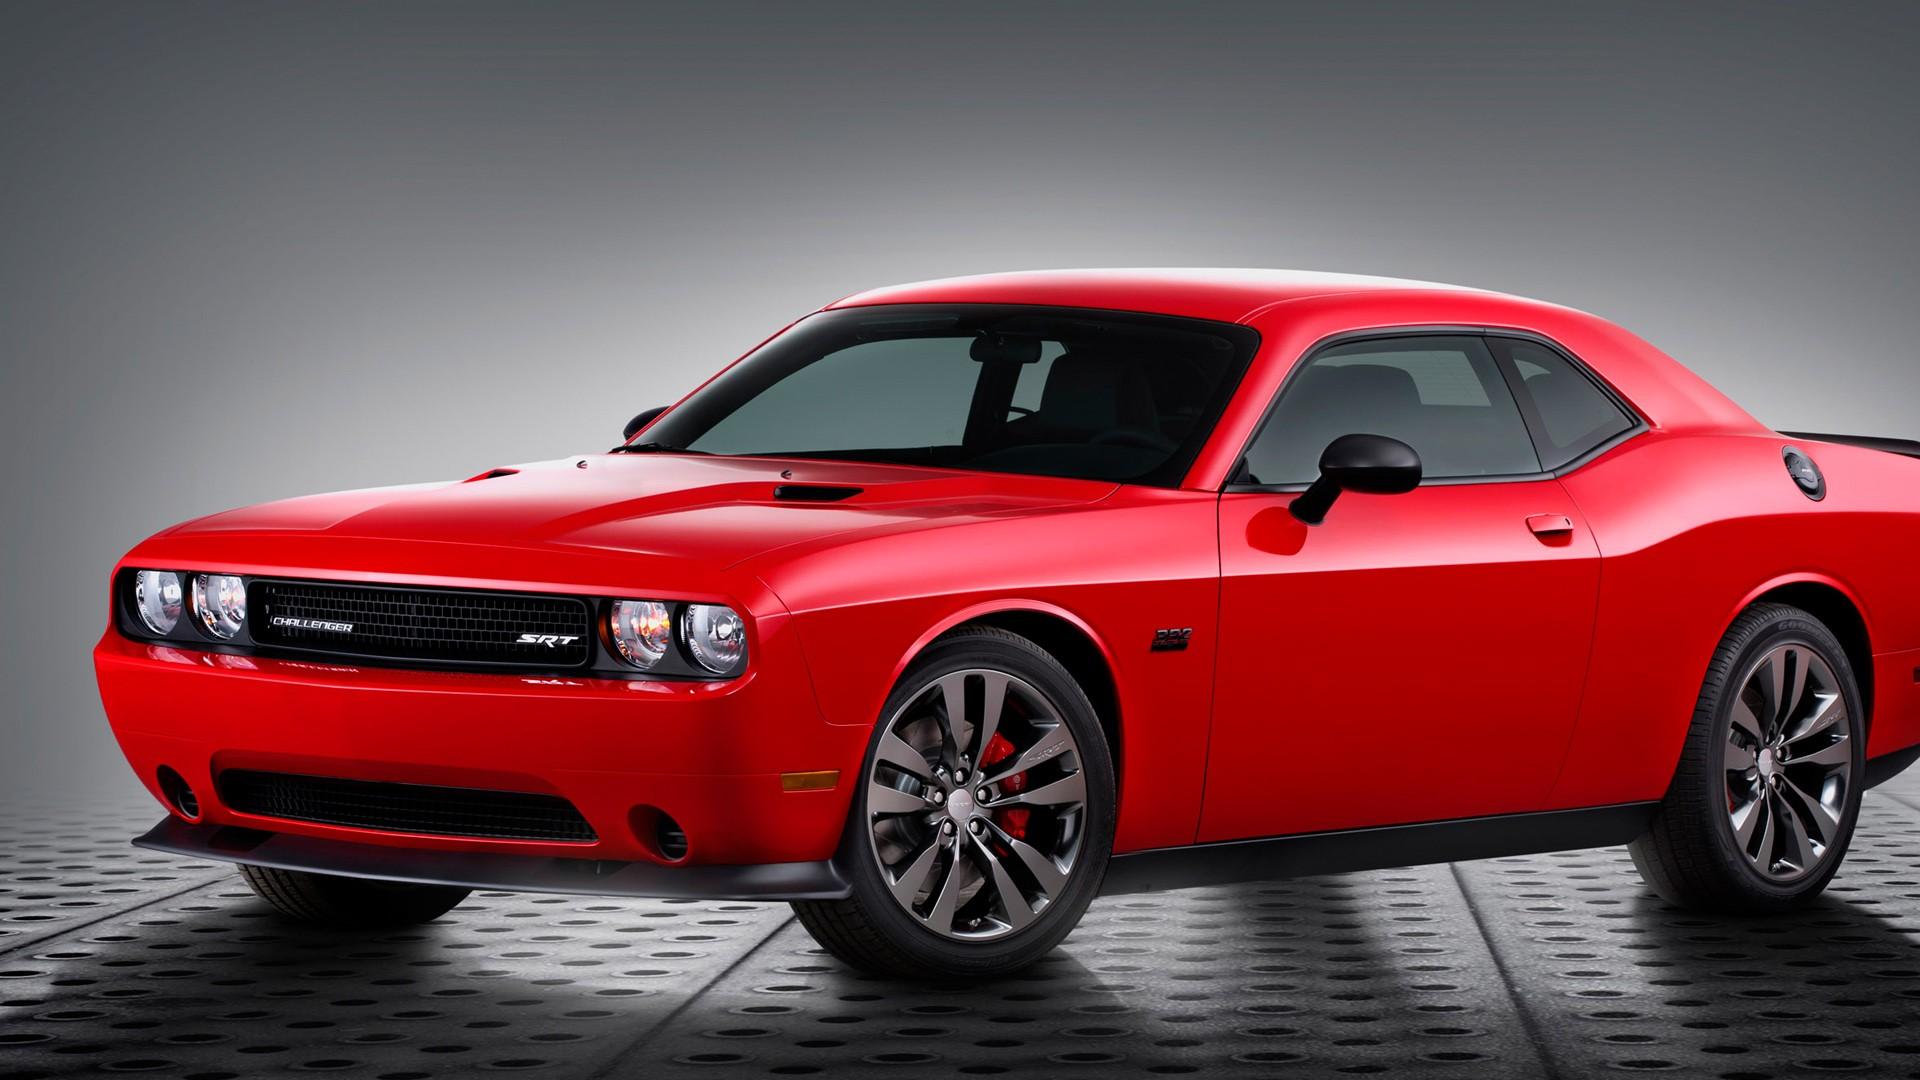 2014 Dodge Challenger Srt Satin Vapor Wallpaper Hd Car